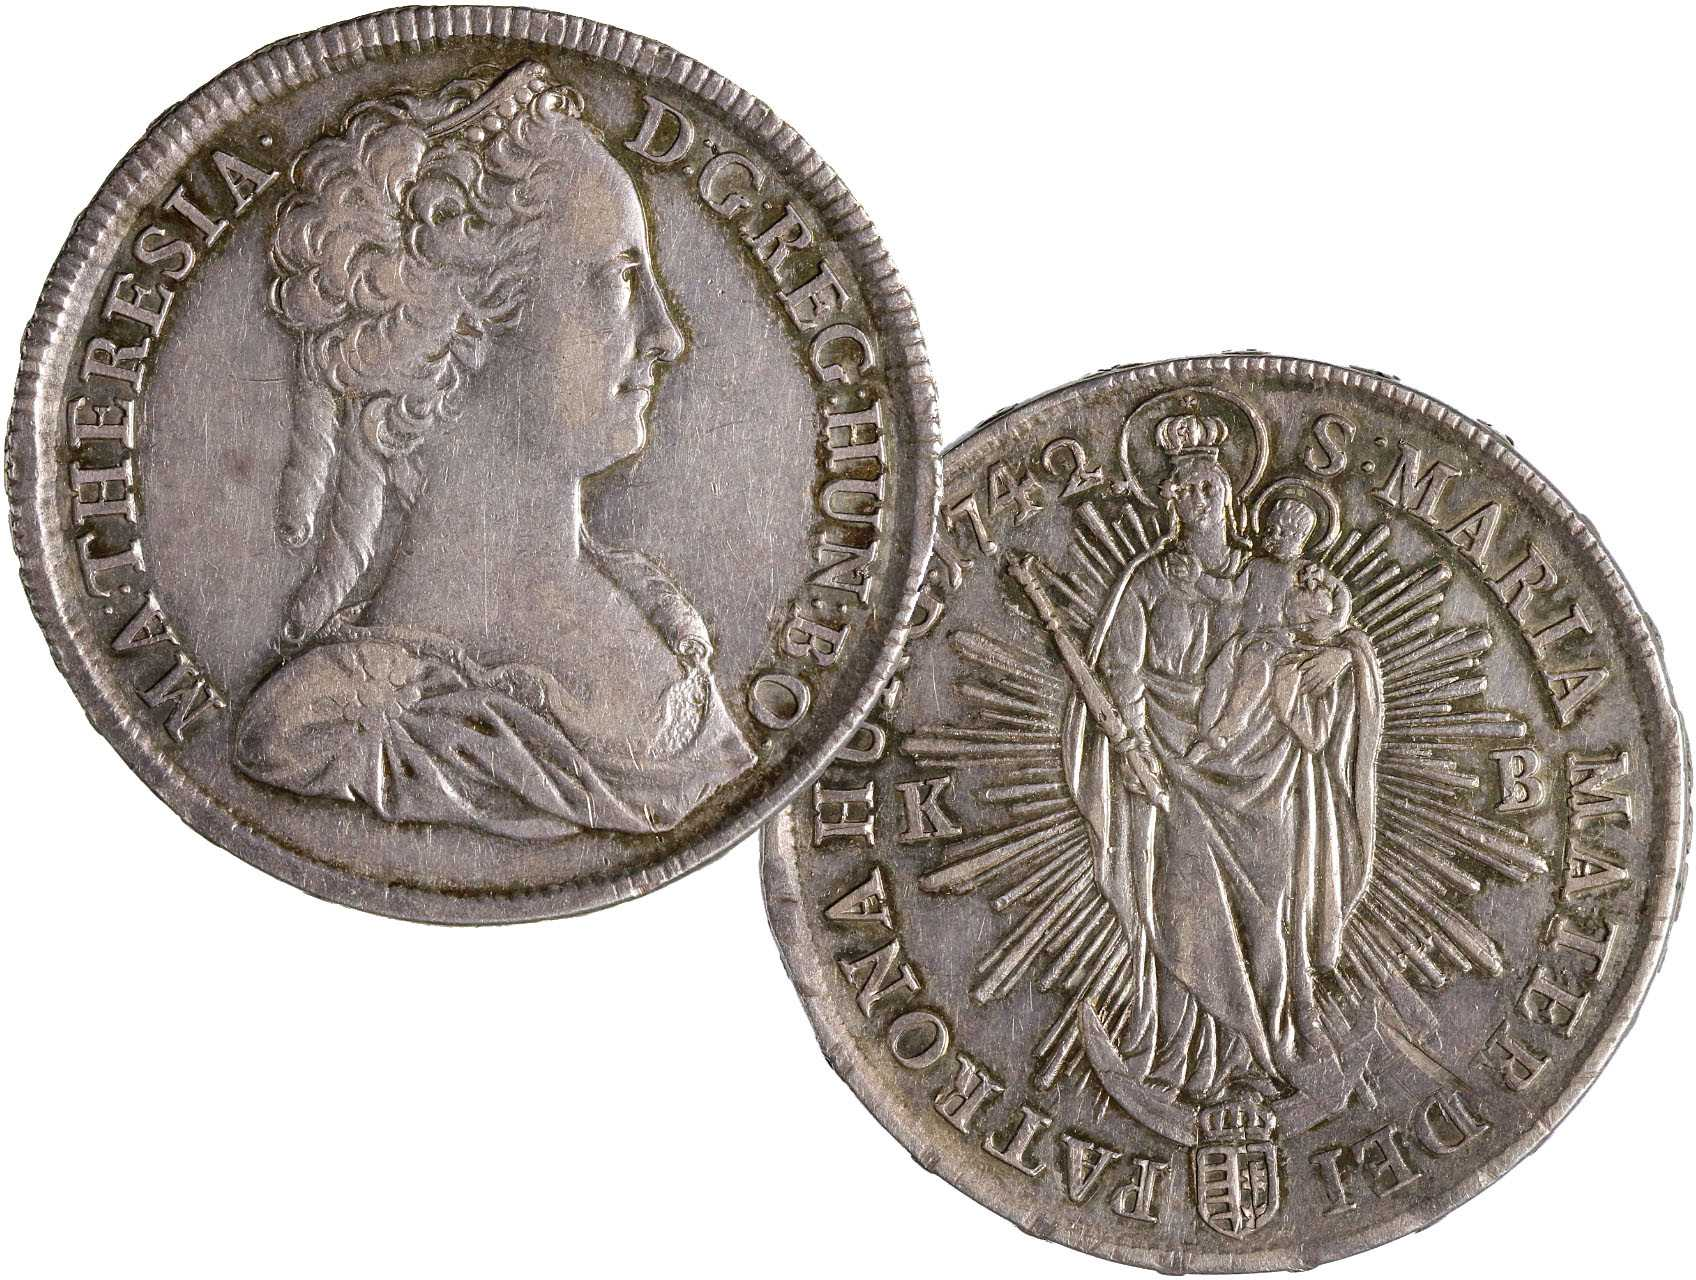 Marie Terezie 1740-1780 - Tolar 1742 KB, Husz. 1667, N99